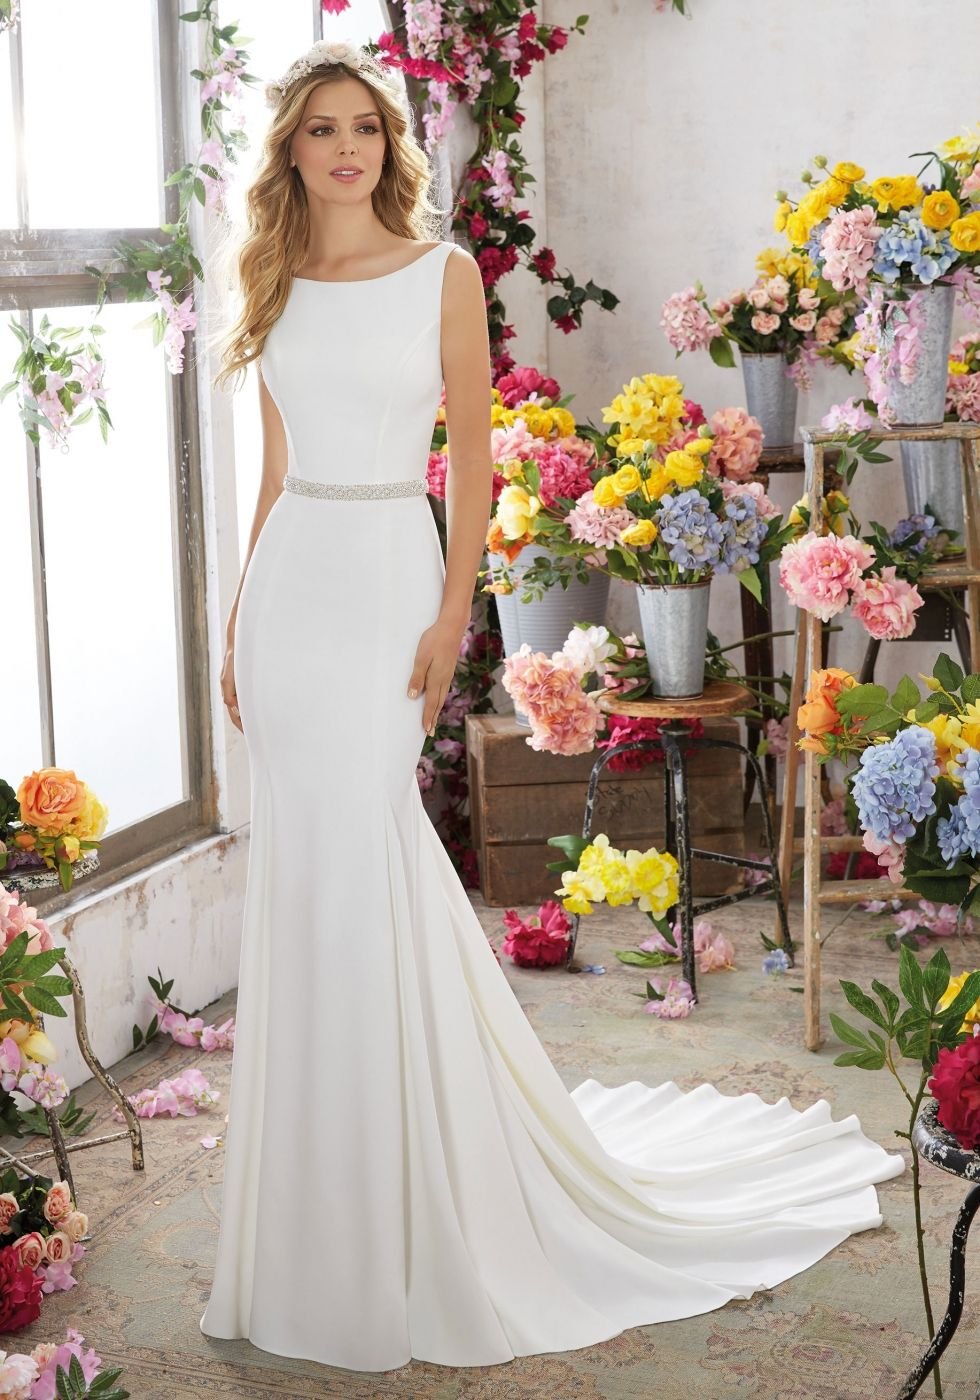 Simple wedding dress. Morilee wedding dress. Plain wedding ...